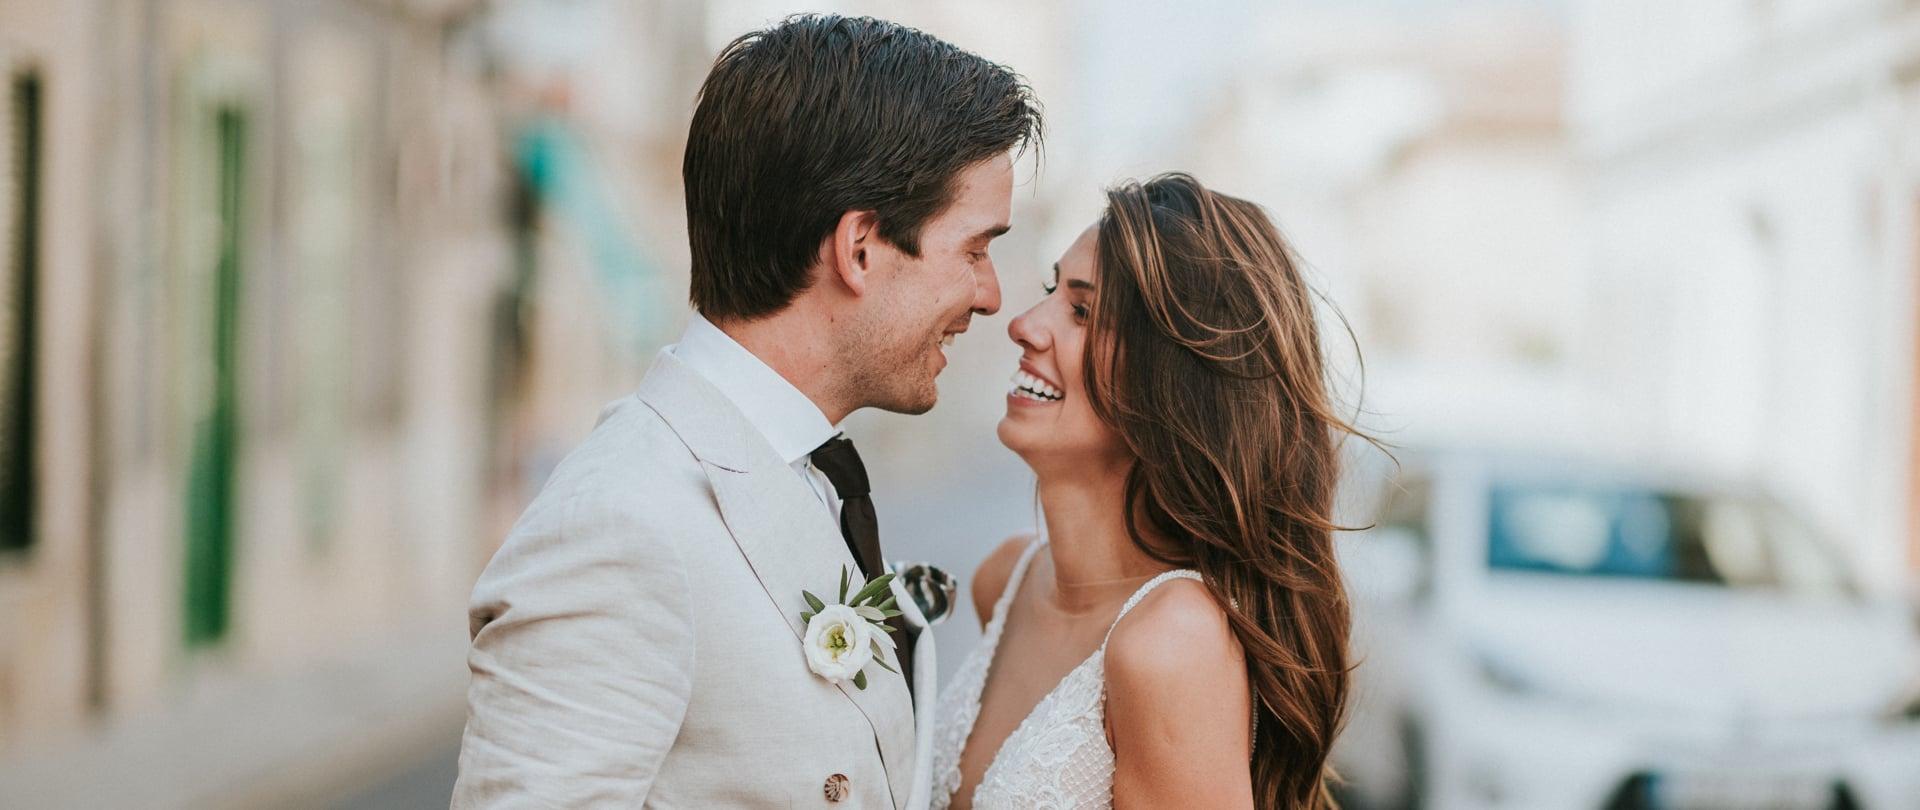 Hülya & Wouter Wedding Video Filmed at Mallorca, Spain